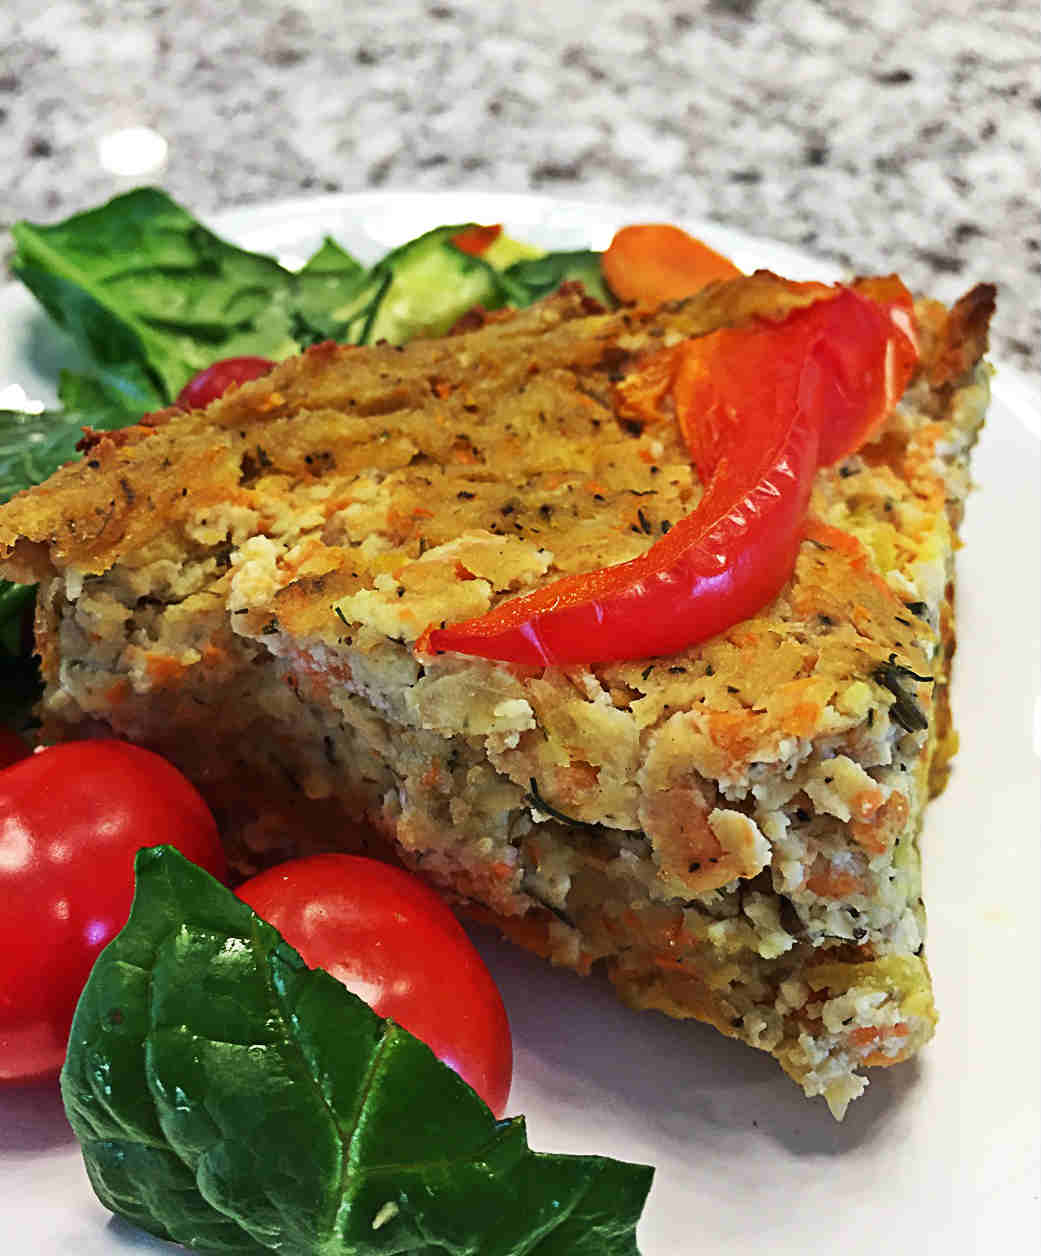 Vegan crustless quiche, with red pepper, gluten-free, oil-free, tofu, crustless, eggless, great for breakfast, brunch or dinner.